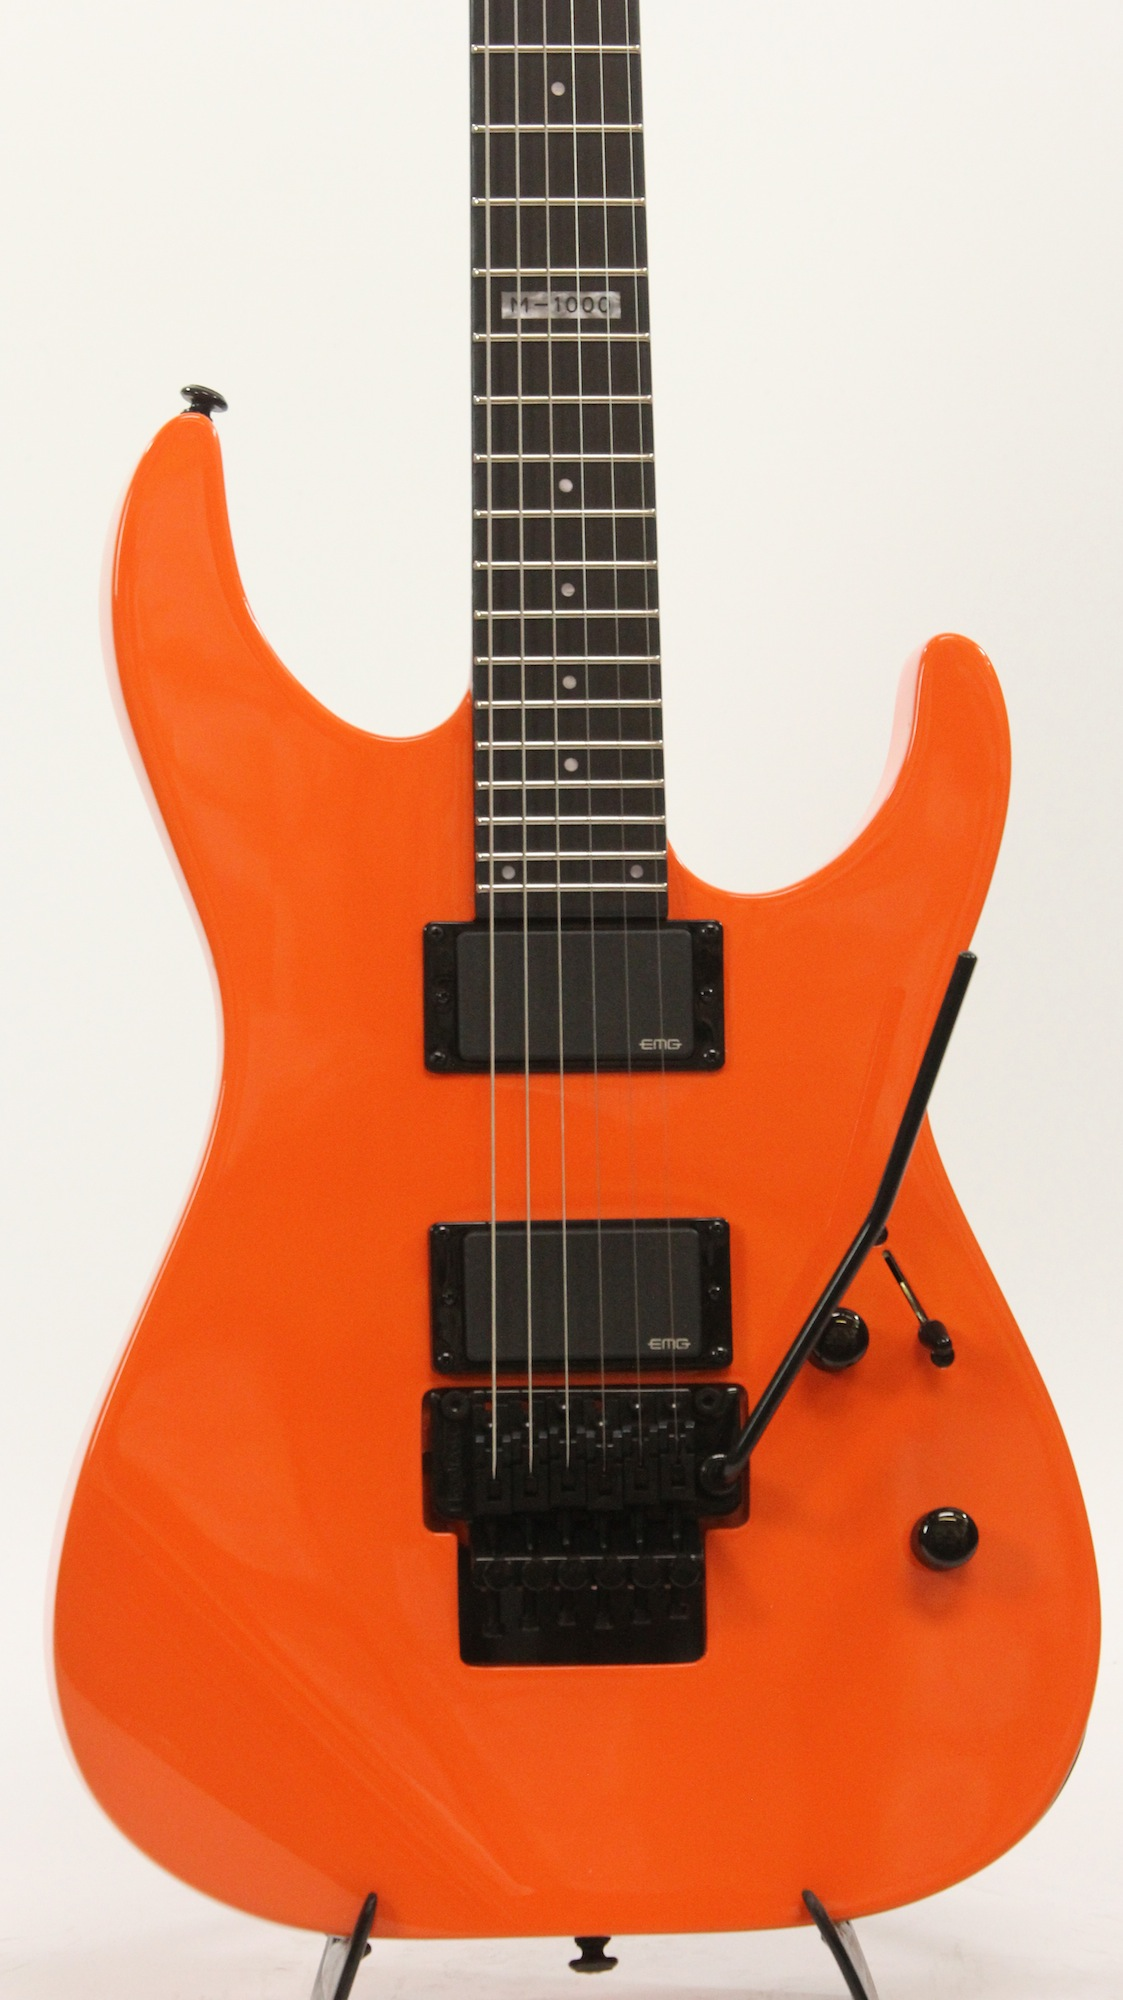 esp ltd m 1000 ggo gogo orange electric guitar 6. Black Bedroom Furniture Sets. Home Design Ideas